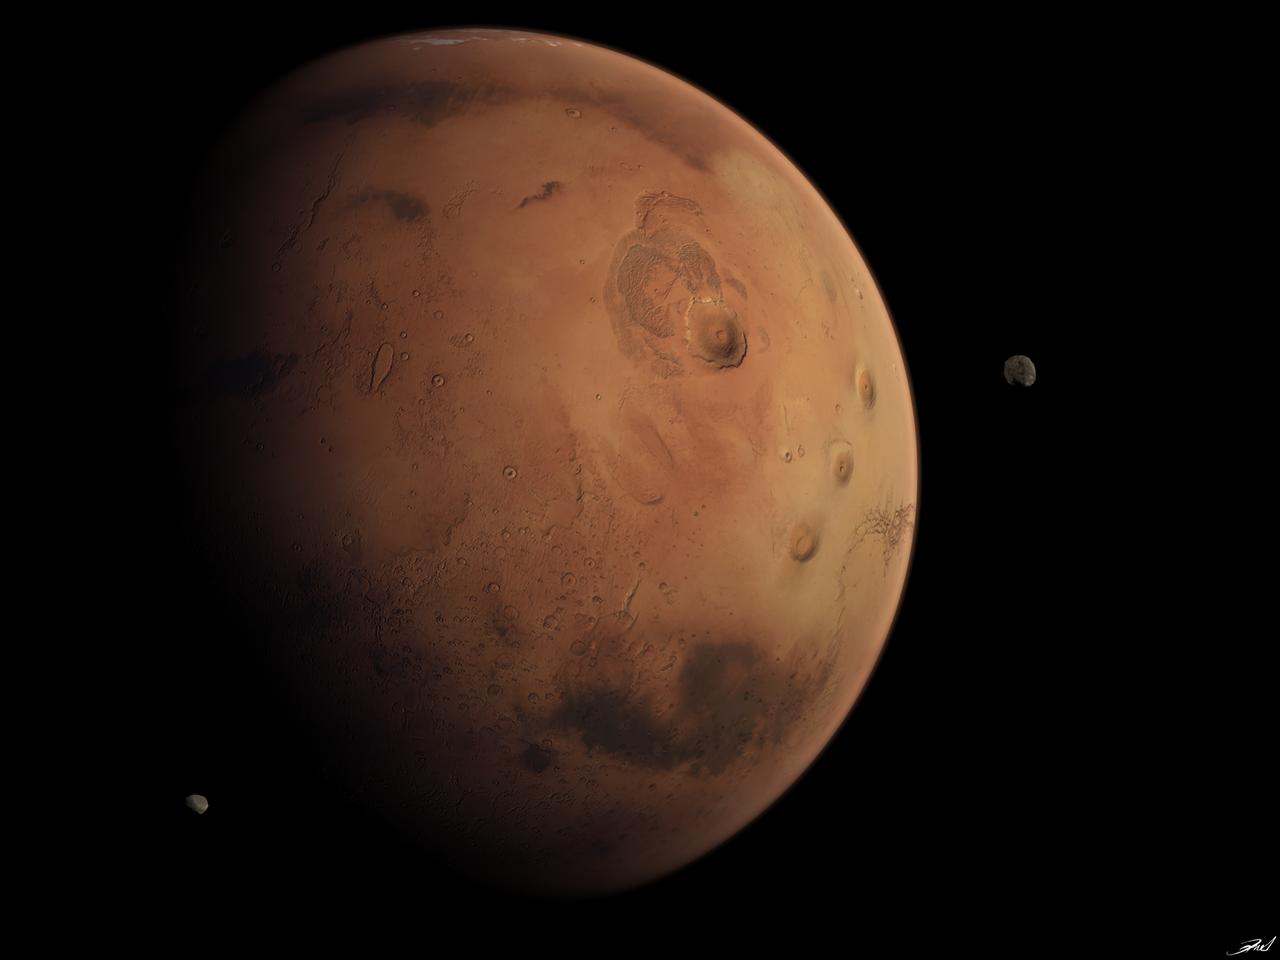 mars moons diameter - HD1280×960